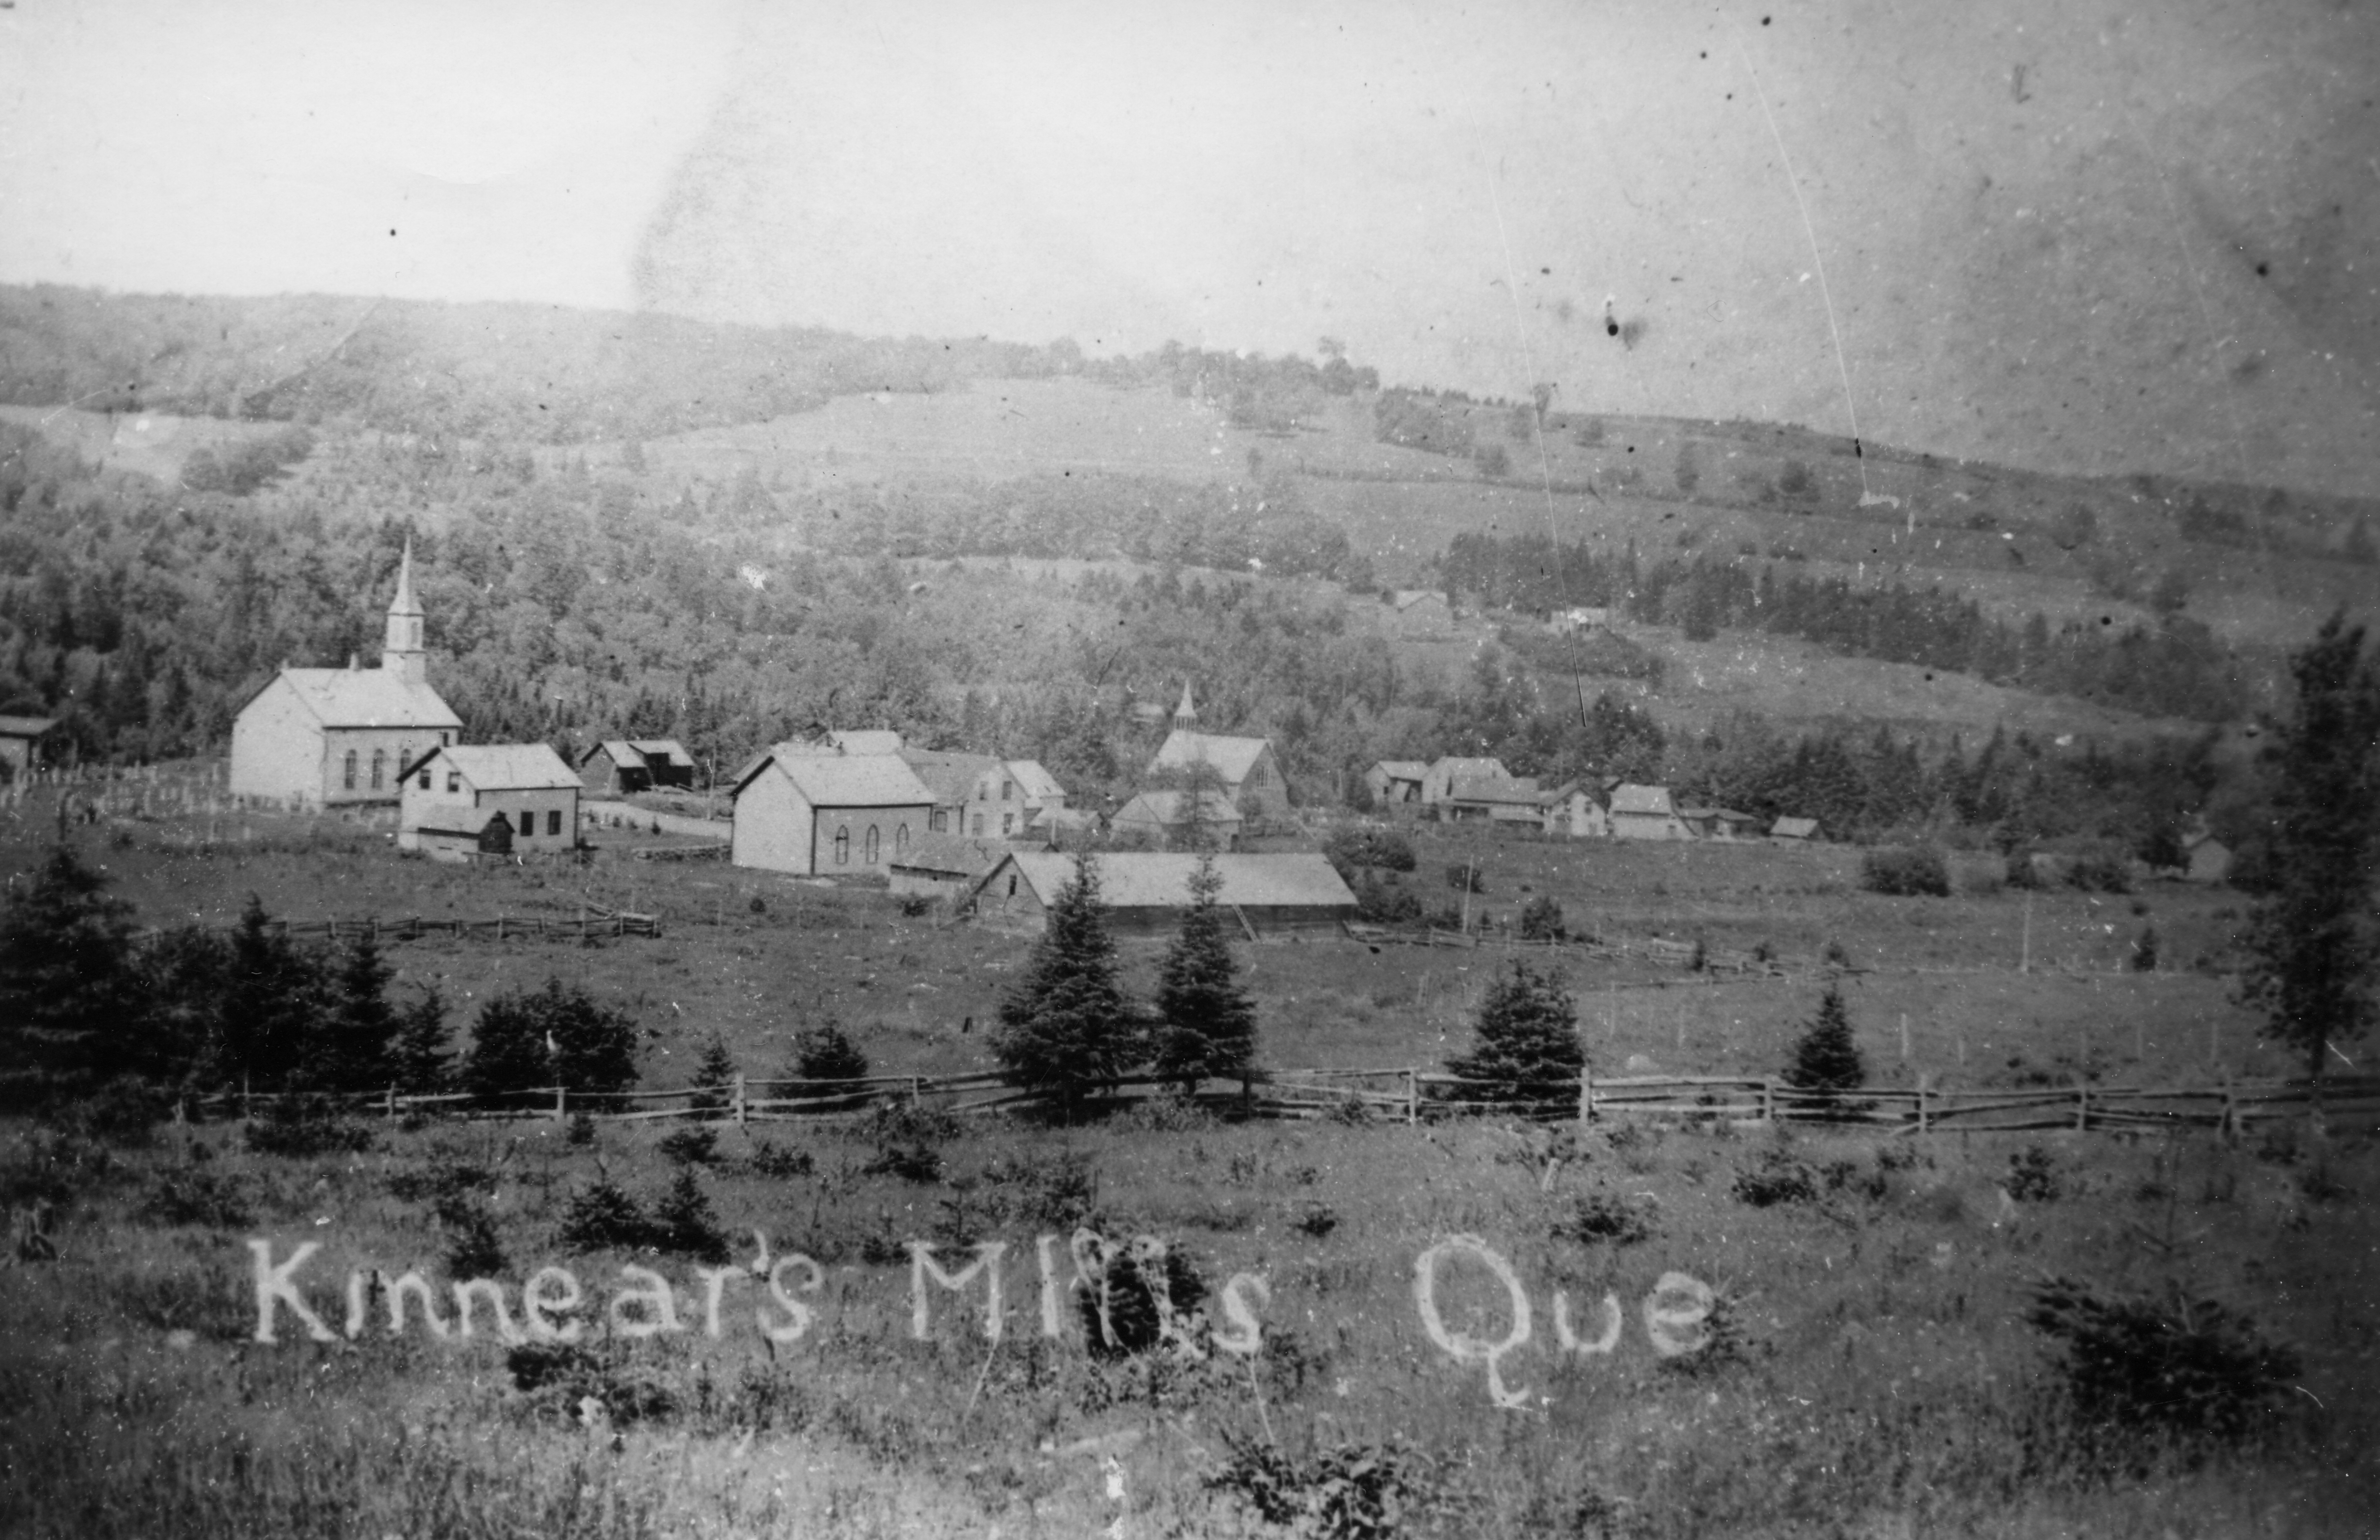 Kinnear's Mills vers1890-1910